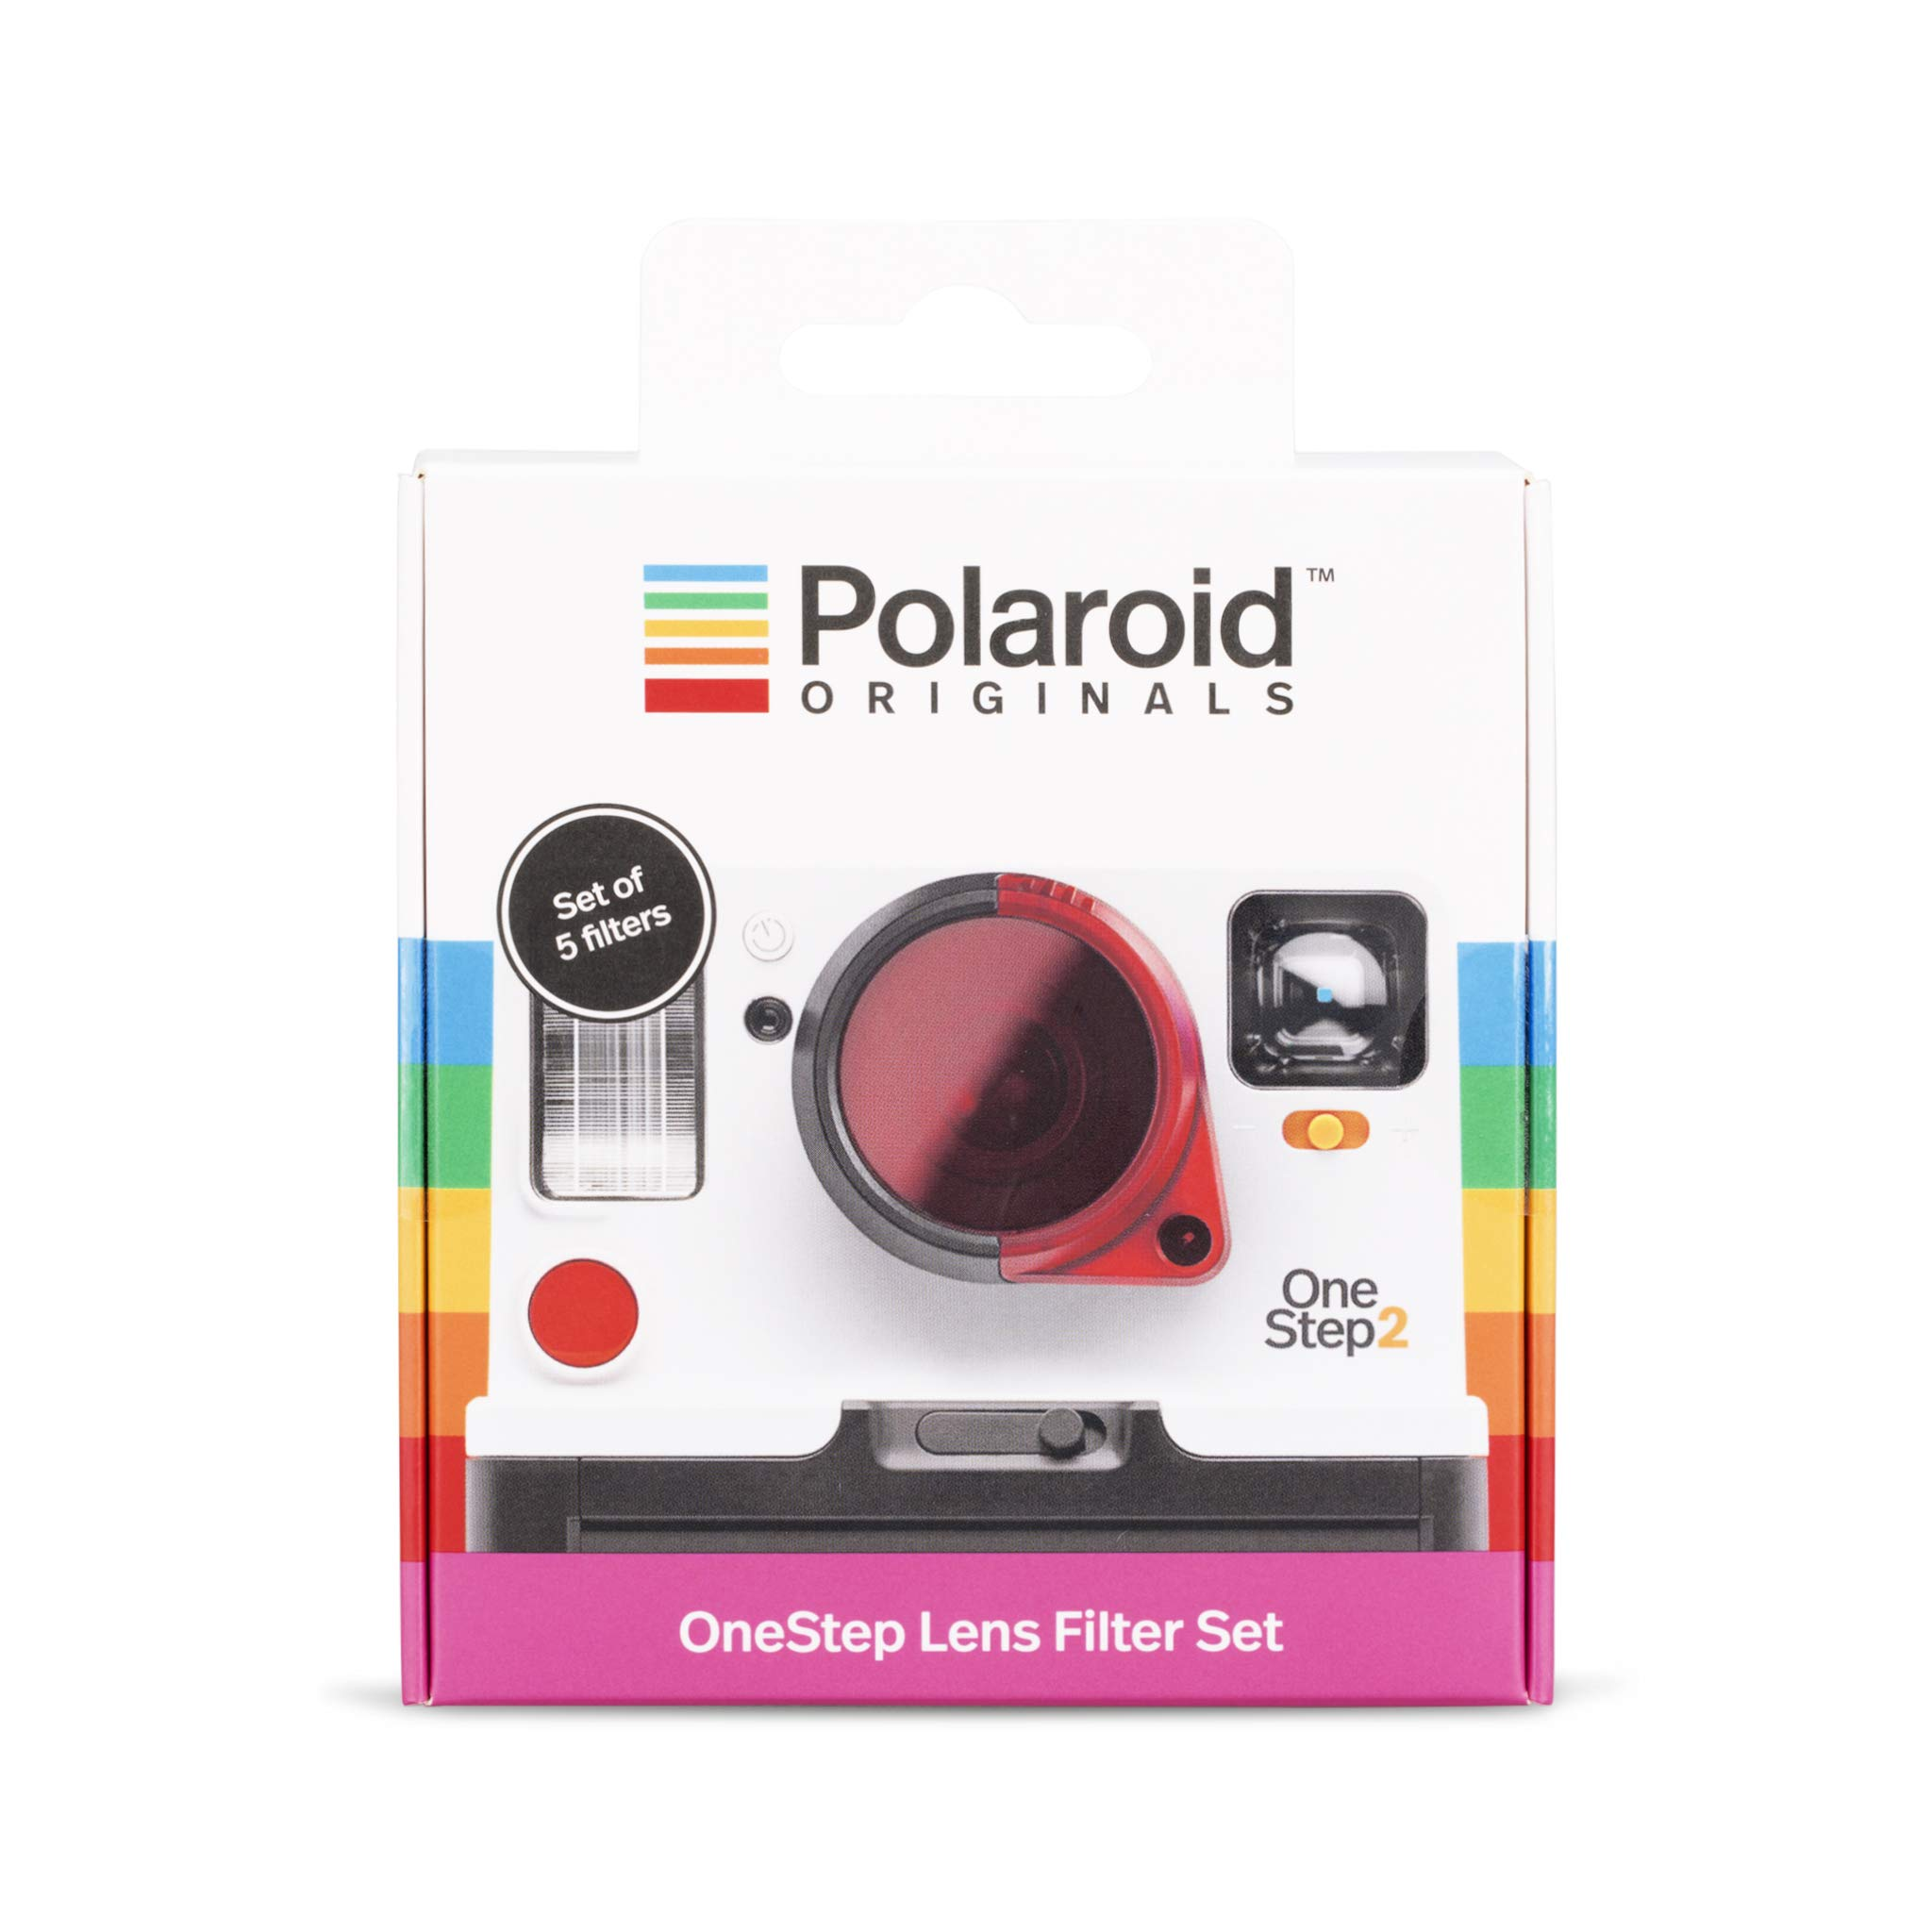 Polaroid Originals 4690 One-step Lens Filter Set, White by Polaroid Originals